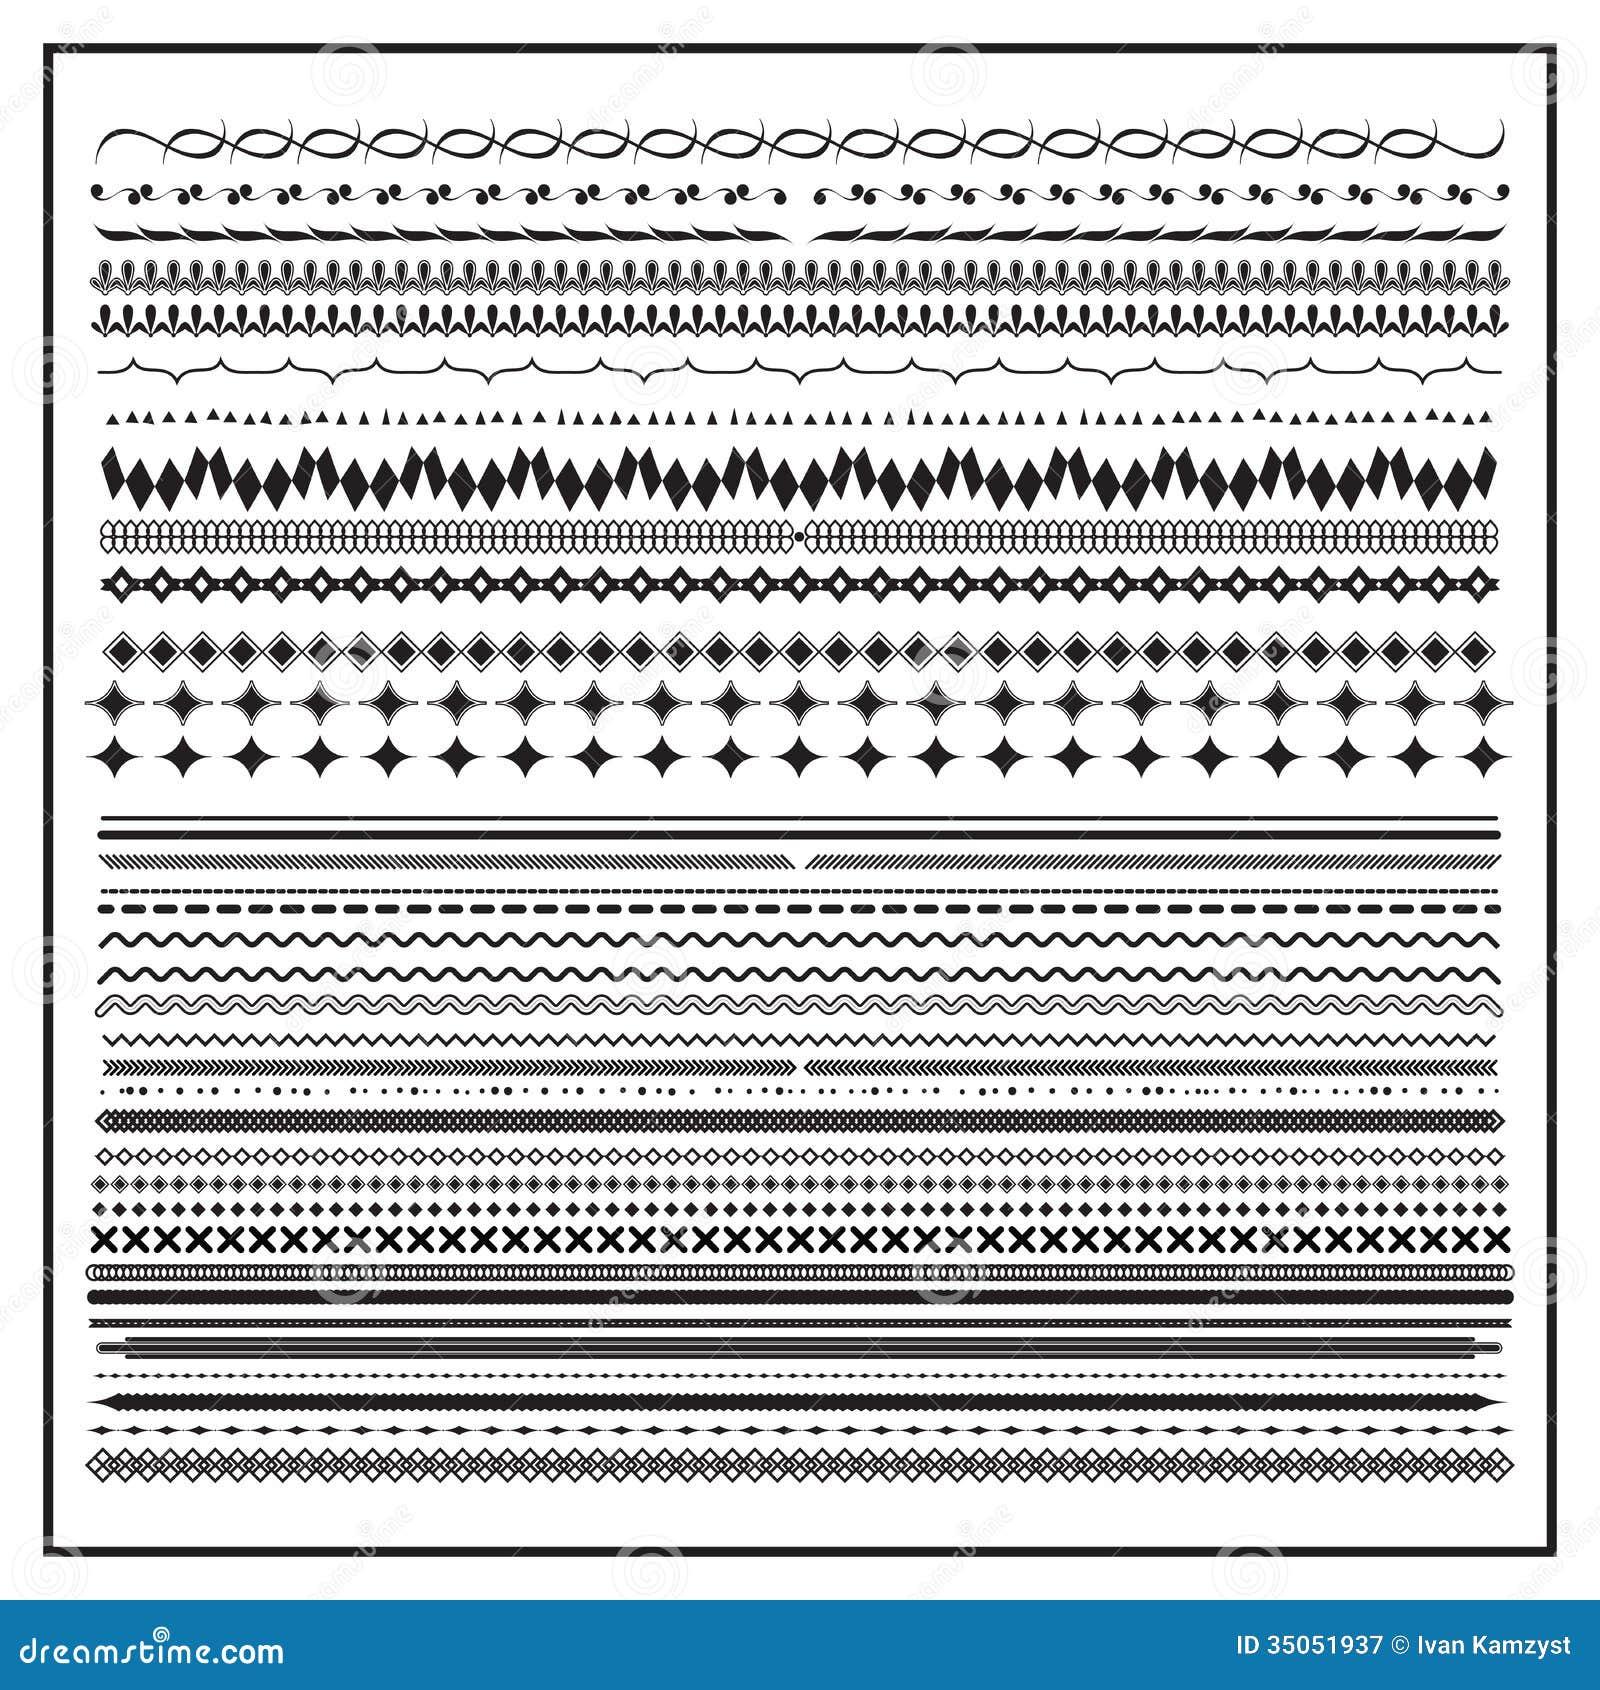 Border Line Design Free Download - Cliparts.co |Desing Line Border